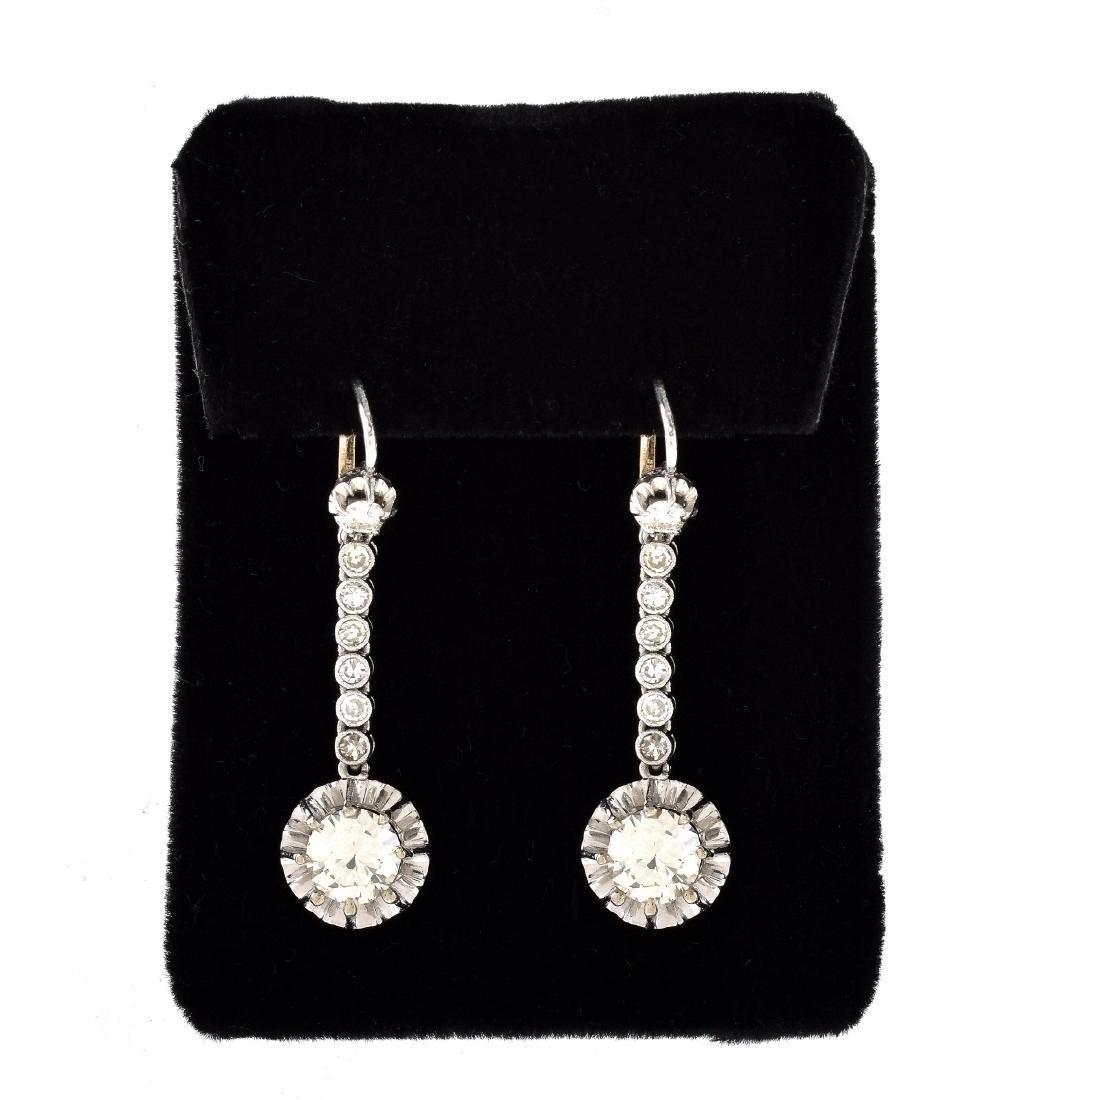 Diamond, Platinum and 14K Gold Earrings.